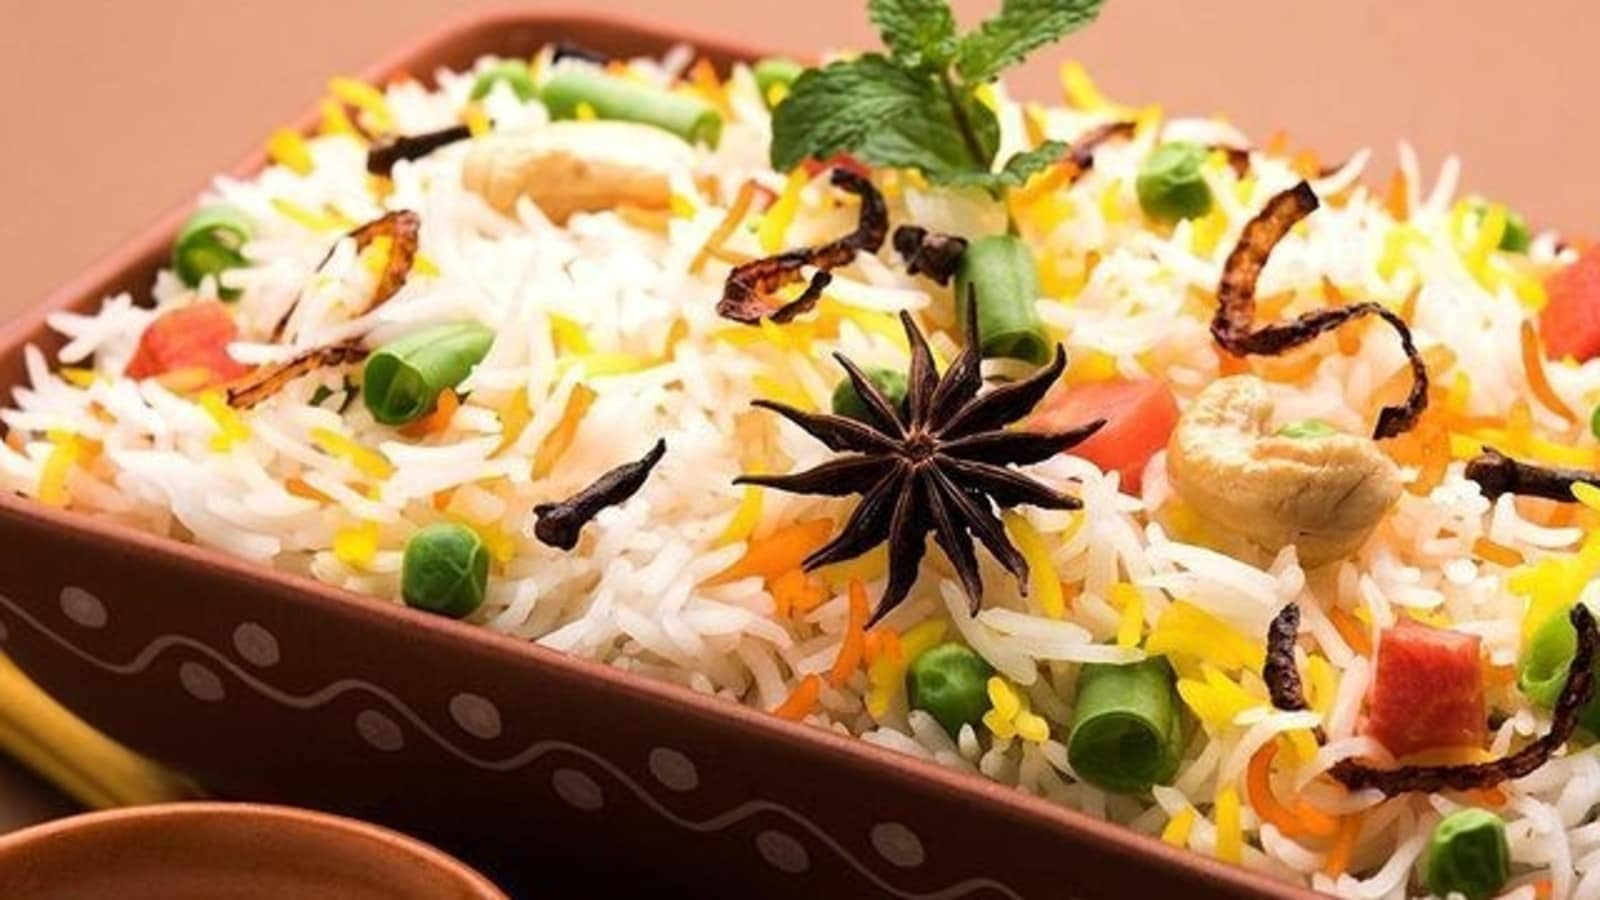 Ramadan 2021: Give iftar a vegetarian spin with Zaitooni Subz Biryani recipe